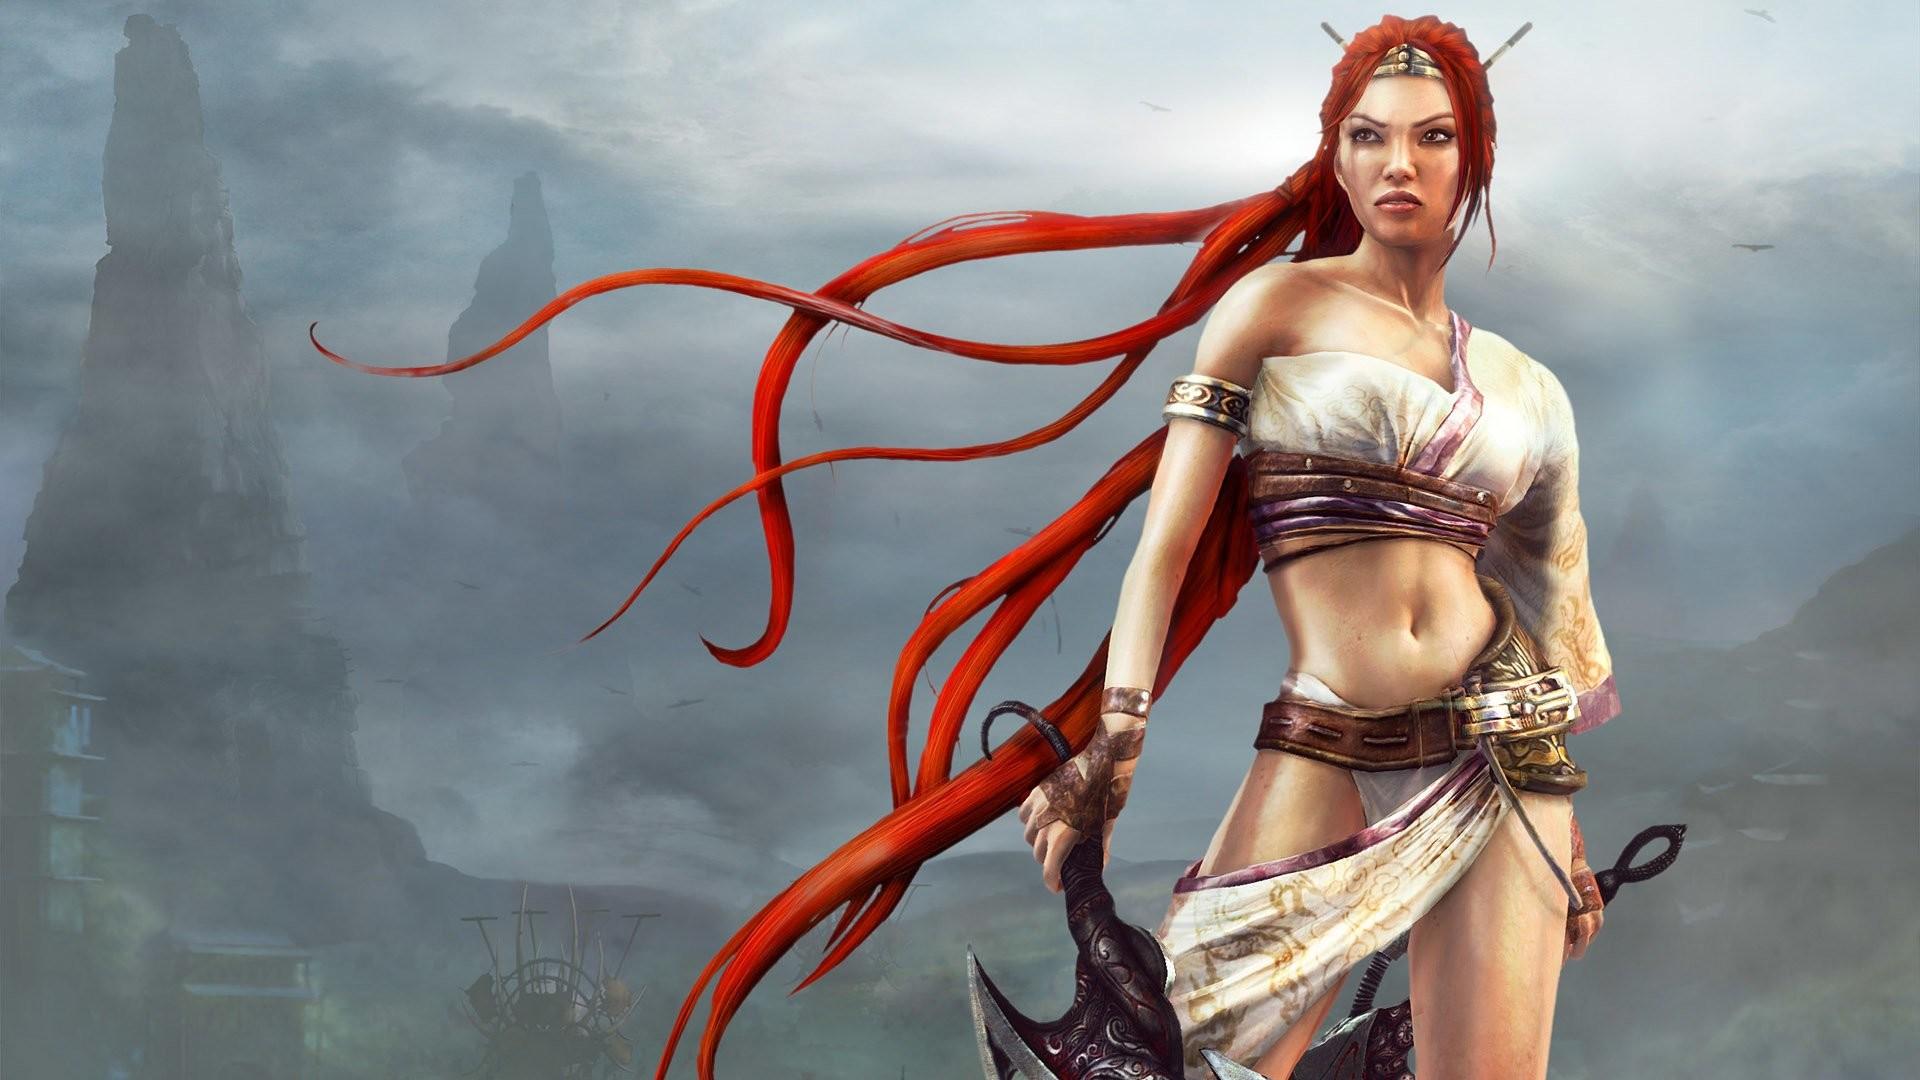 Video Game – Heavenly Sword Fantasy Woman Warrior Woman Girl Redhead  Wallpaper